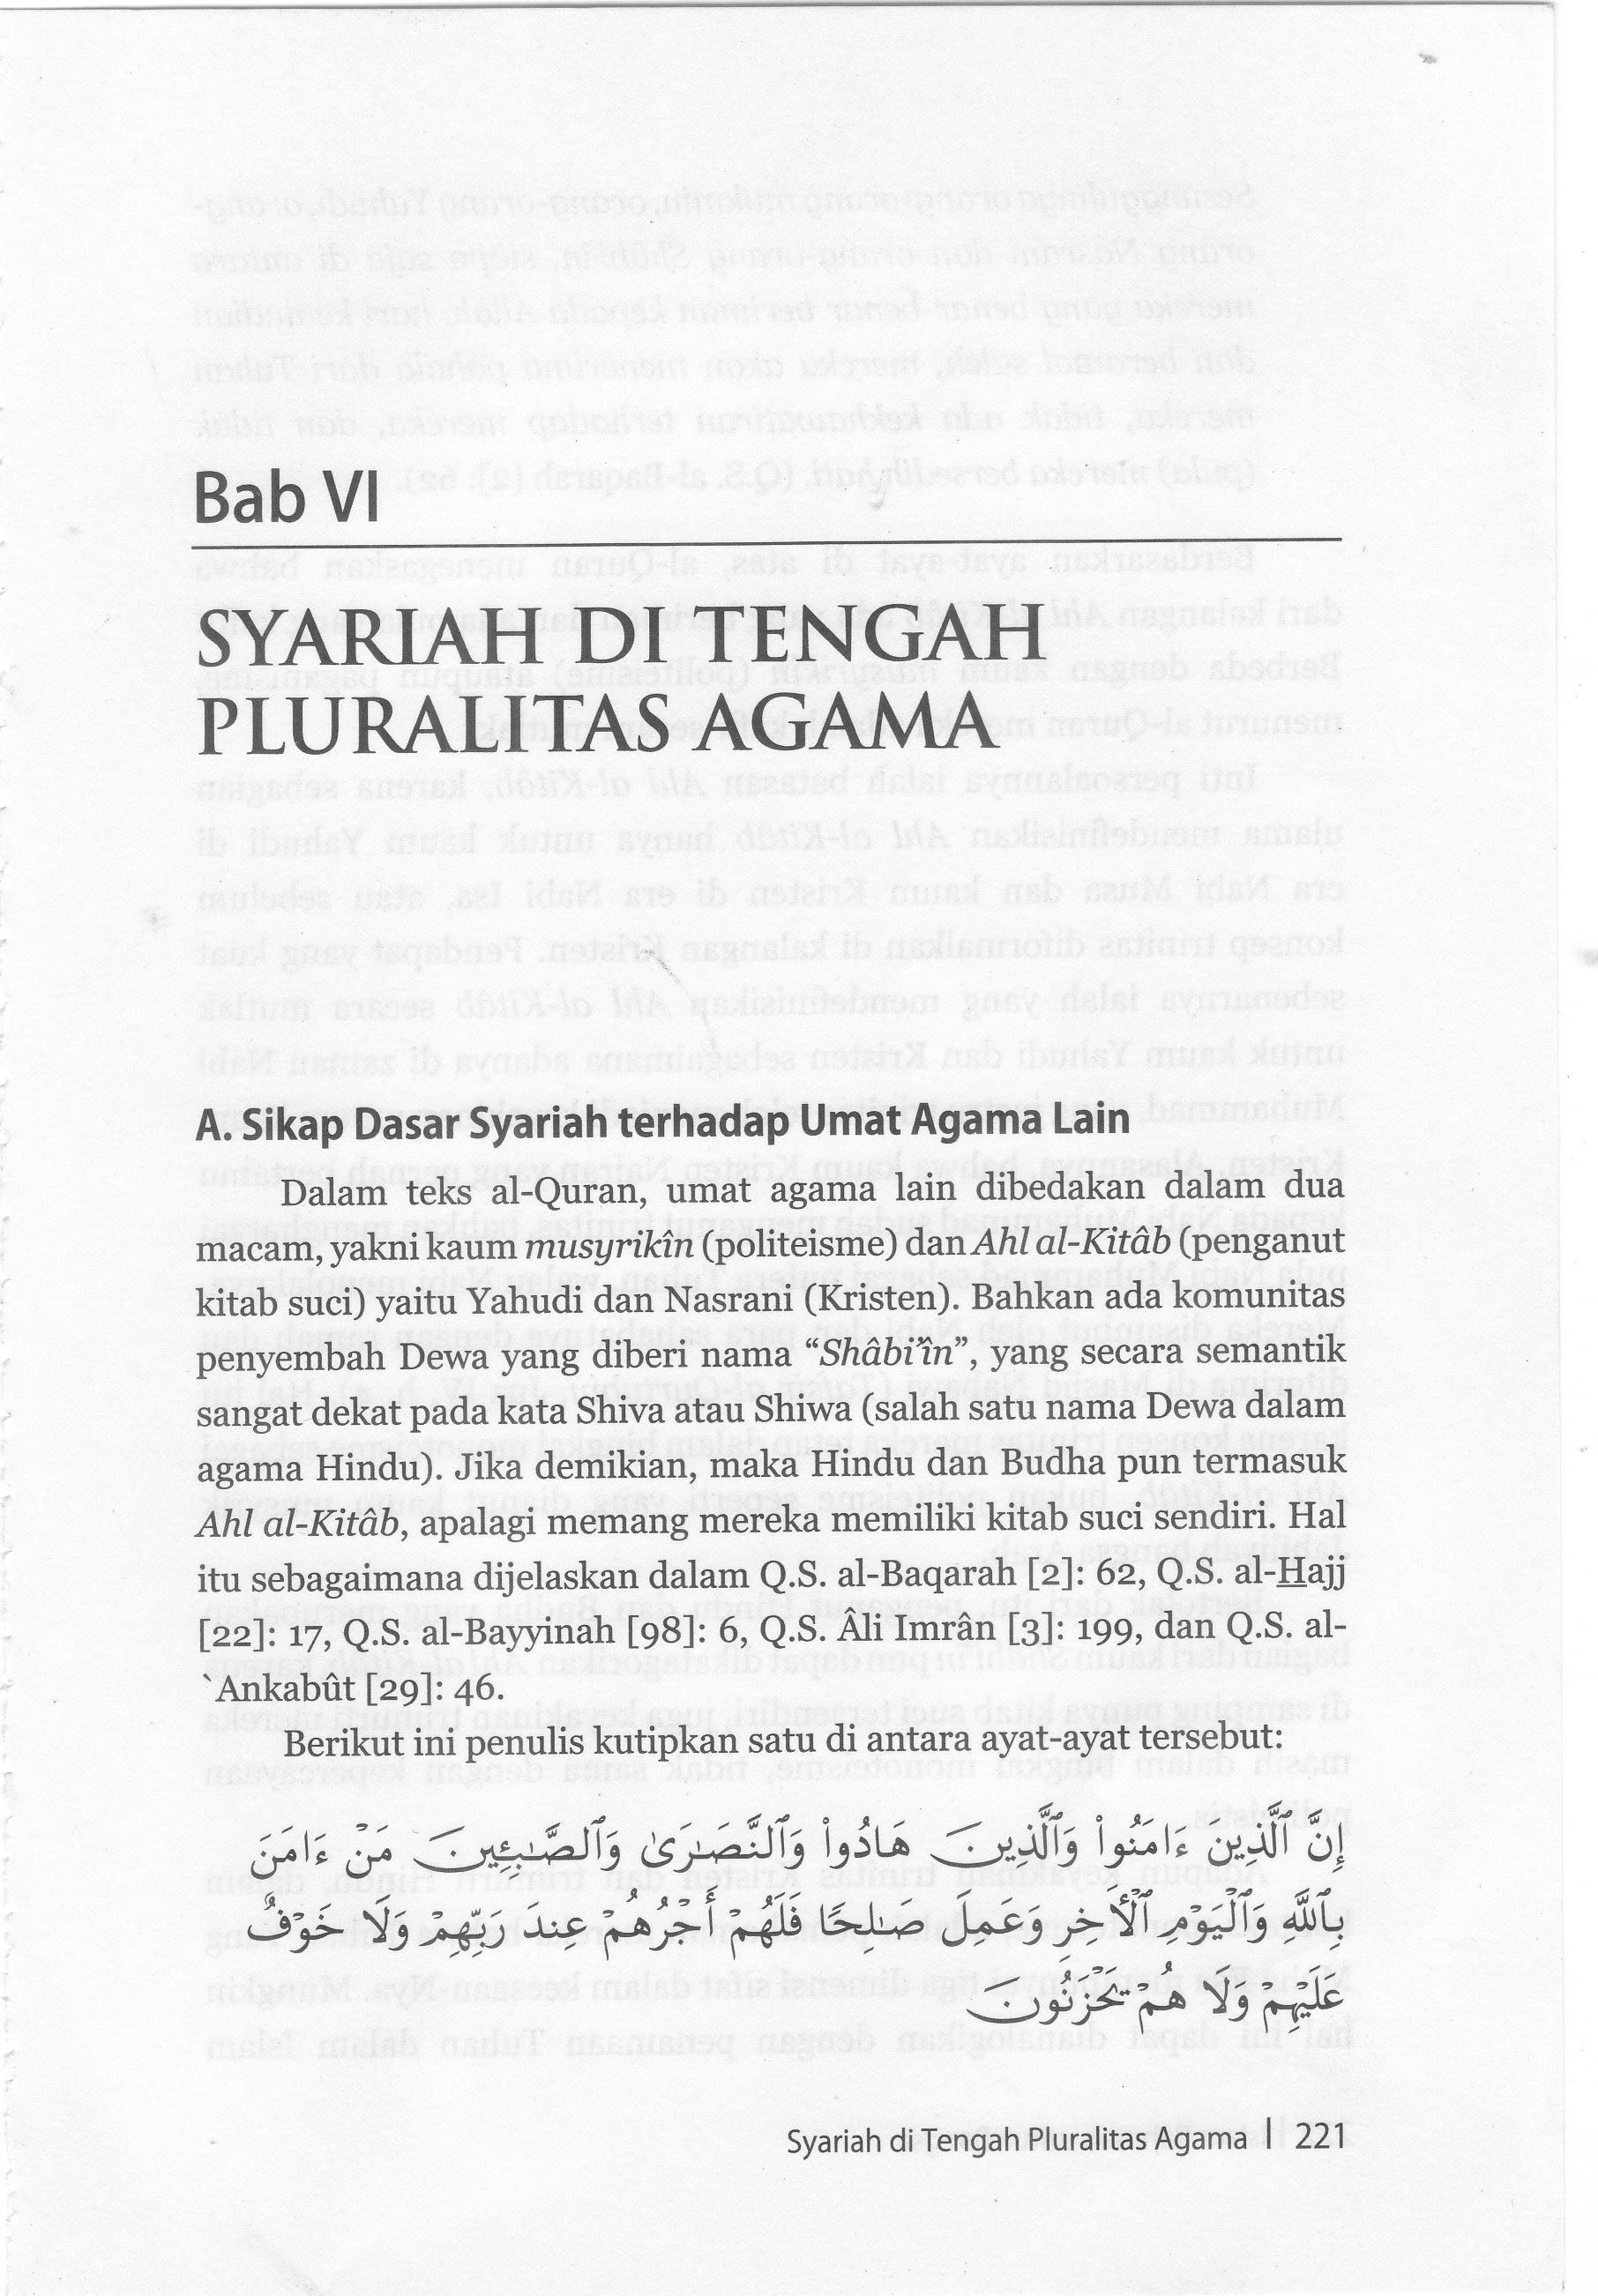 AJARAN ISLAM TENTANG AHLU KITAB DAN MUSYRIKIN